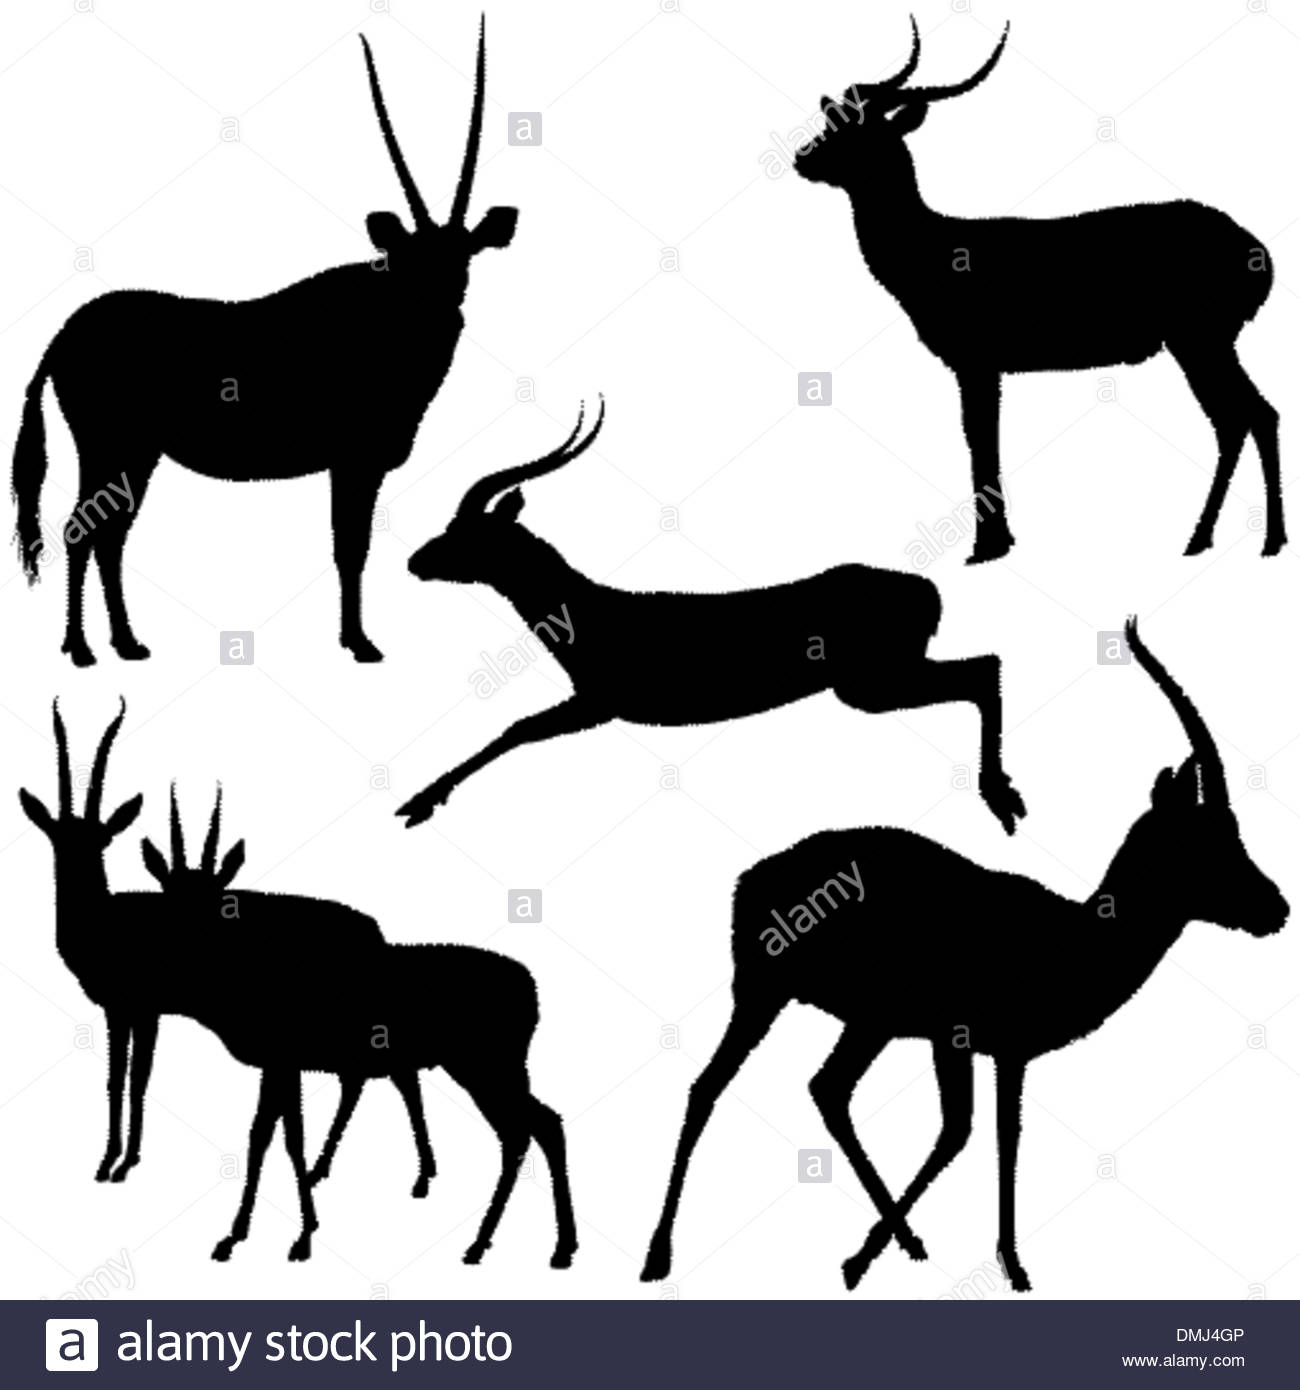 1300x1390 Antelope Silhouettes Stock Vector Art Amp Illustration, Vector Image